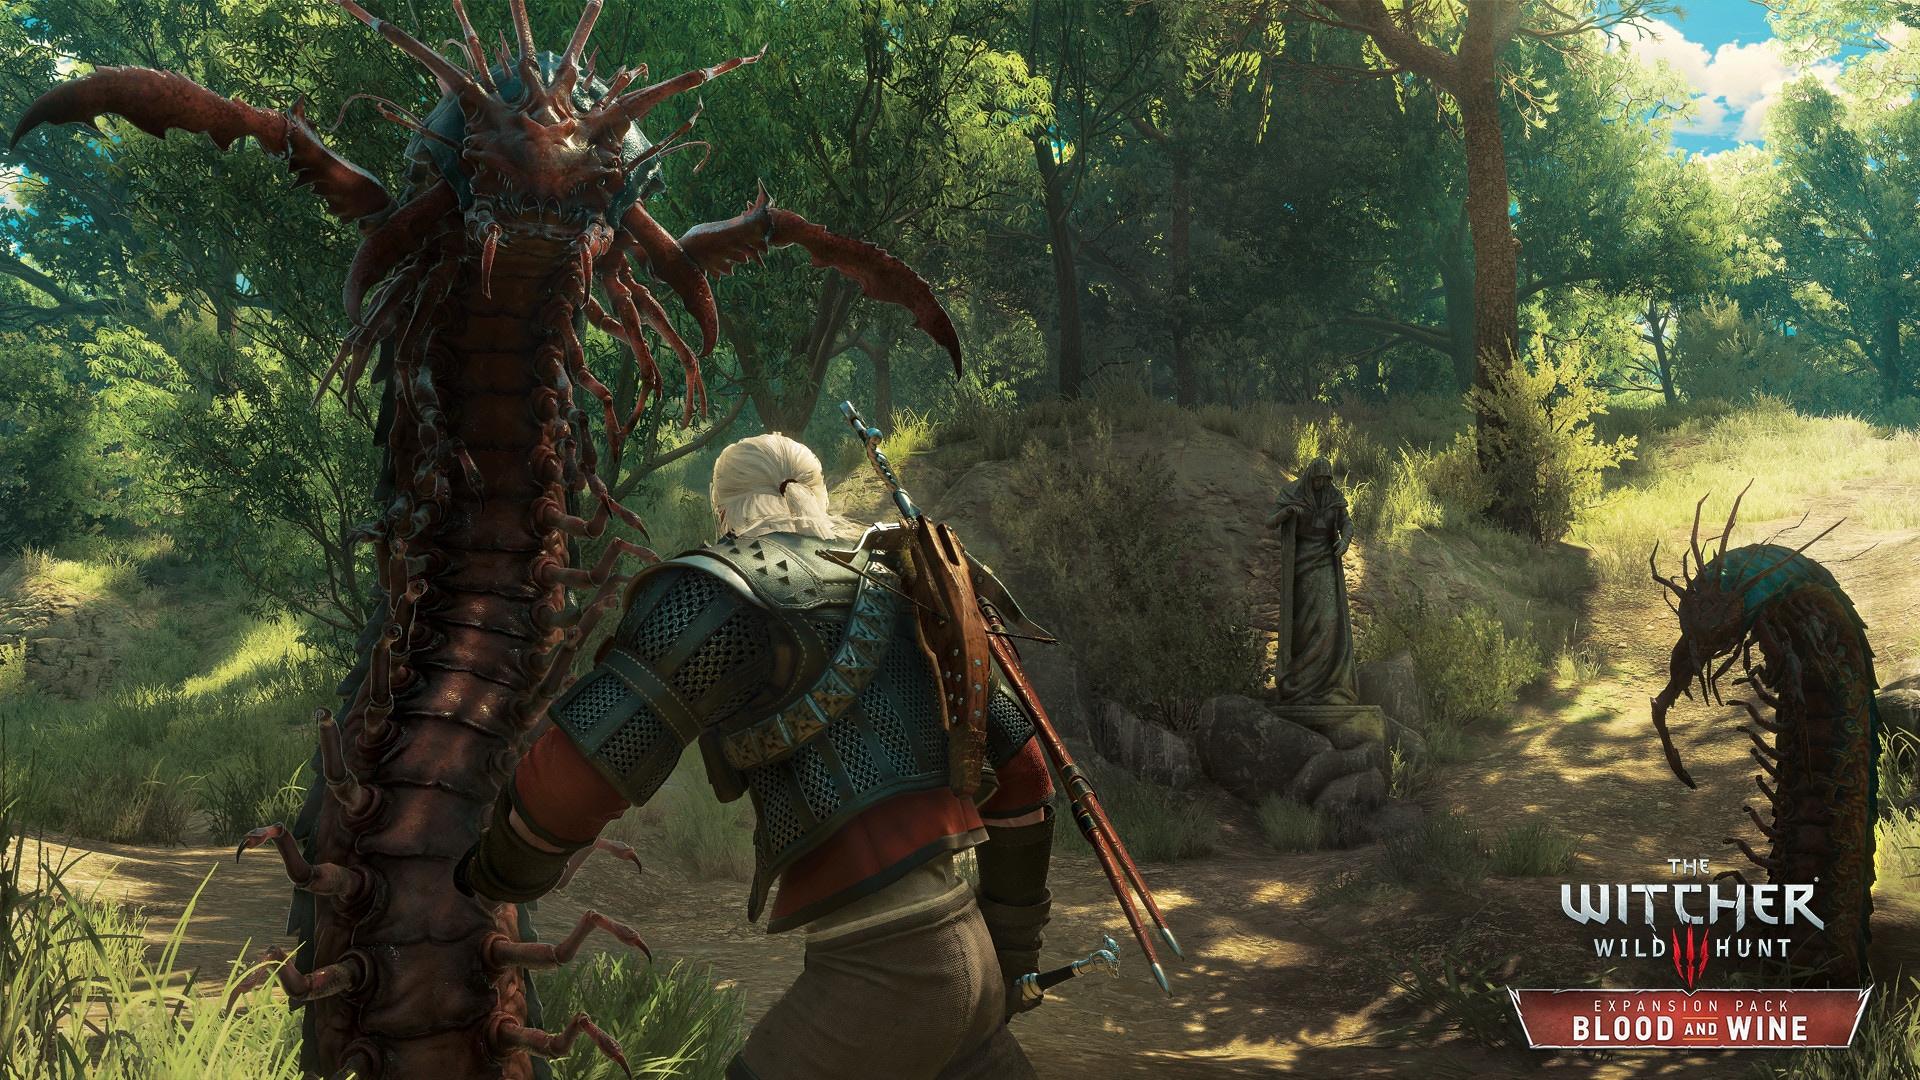 The Witcher 3: Wild Hunt - Blood and Wine Key GOG.COM RU/CIS - 4